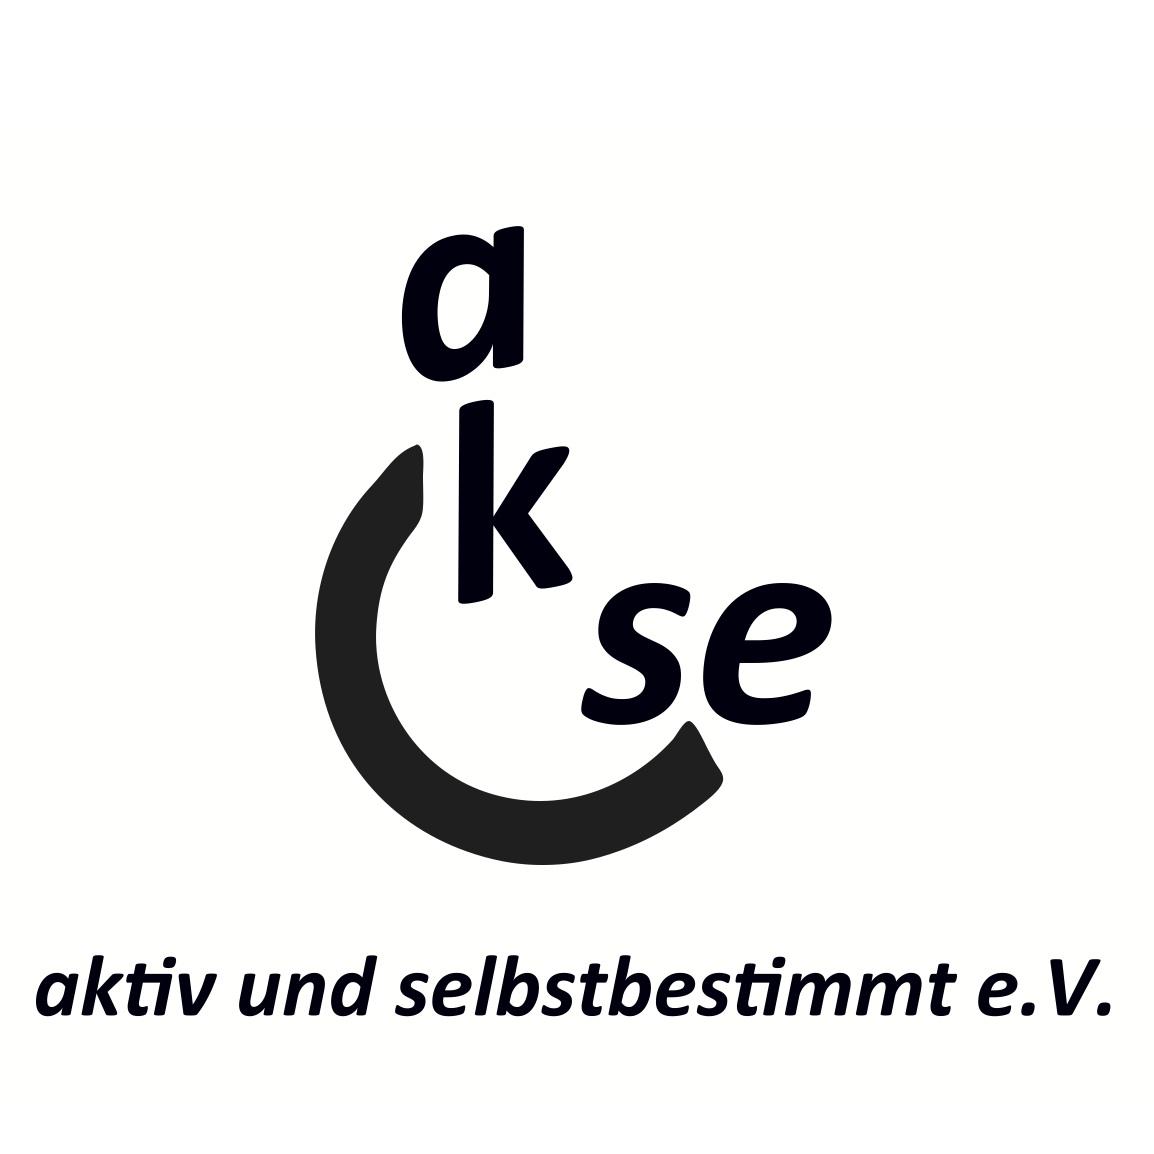 akse logo